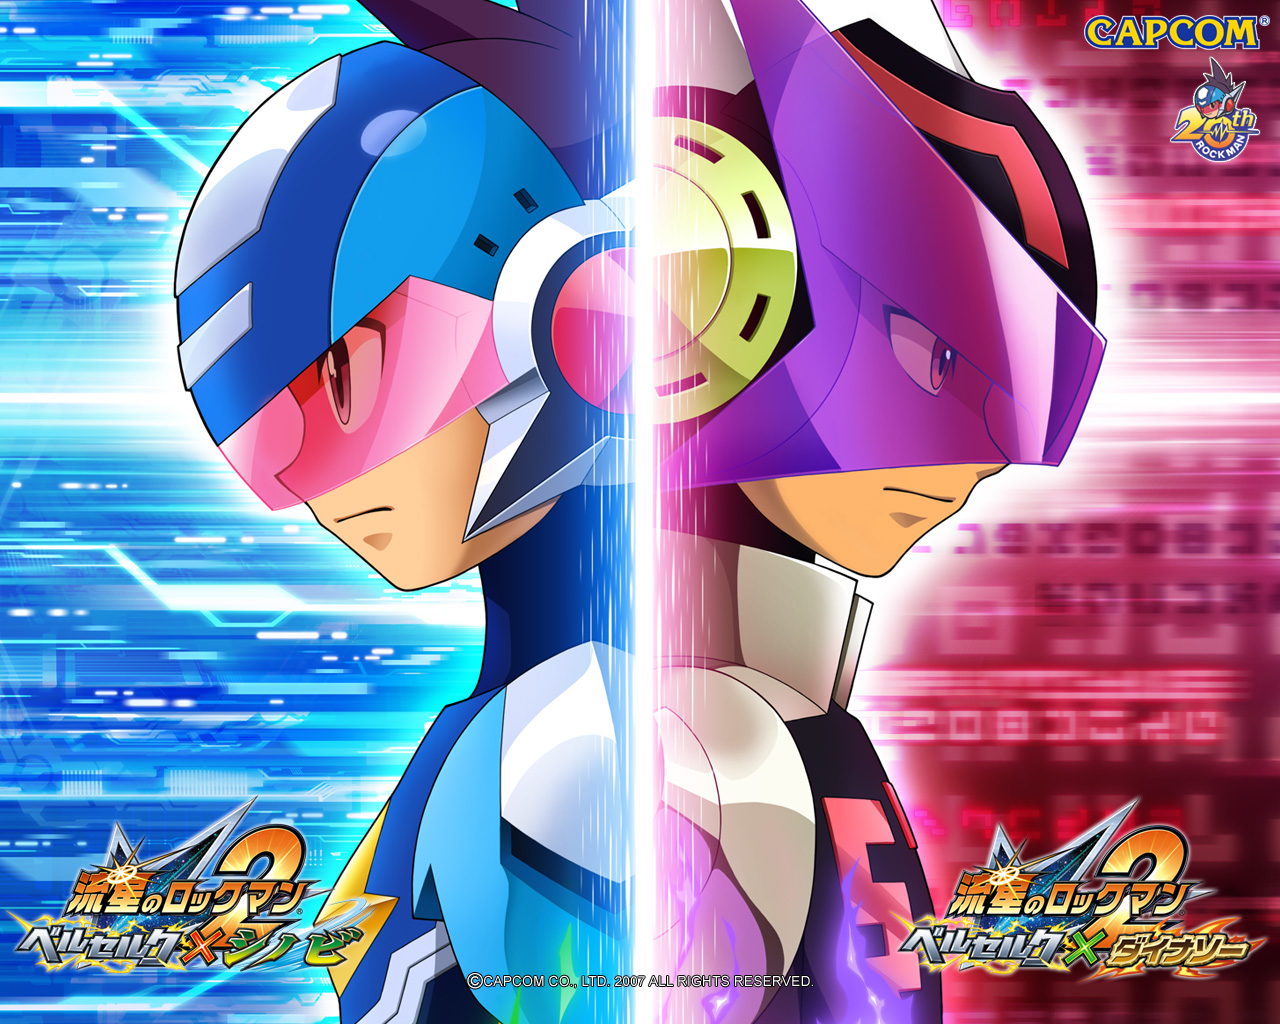 Mega man star force 2 mega man hq fandom powered by wikia - Megaman wikia ...